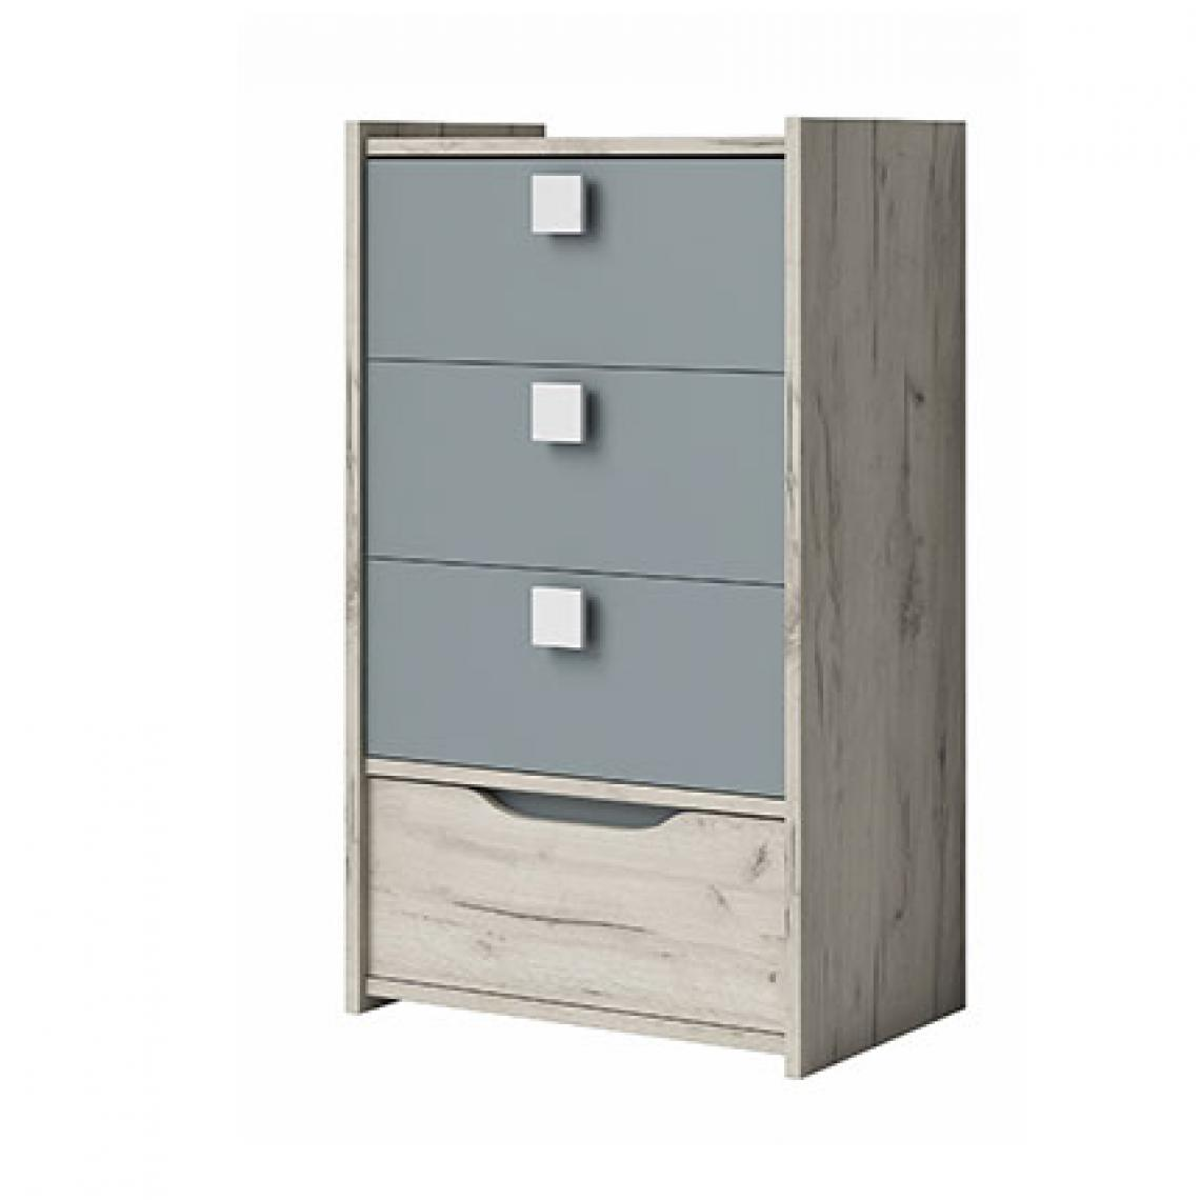 Paris Prix Chiffonnier 4 tiroirs 60 cm décor chêne clair et gris - INAYA